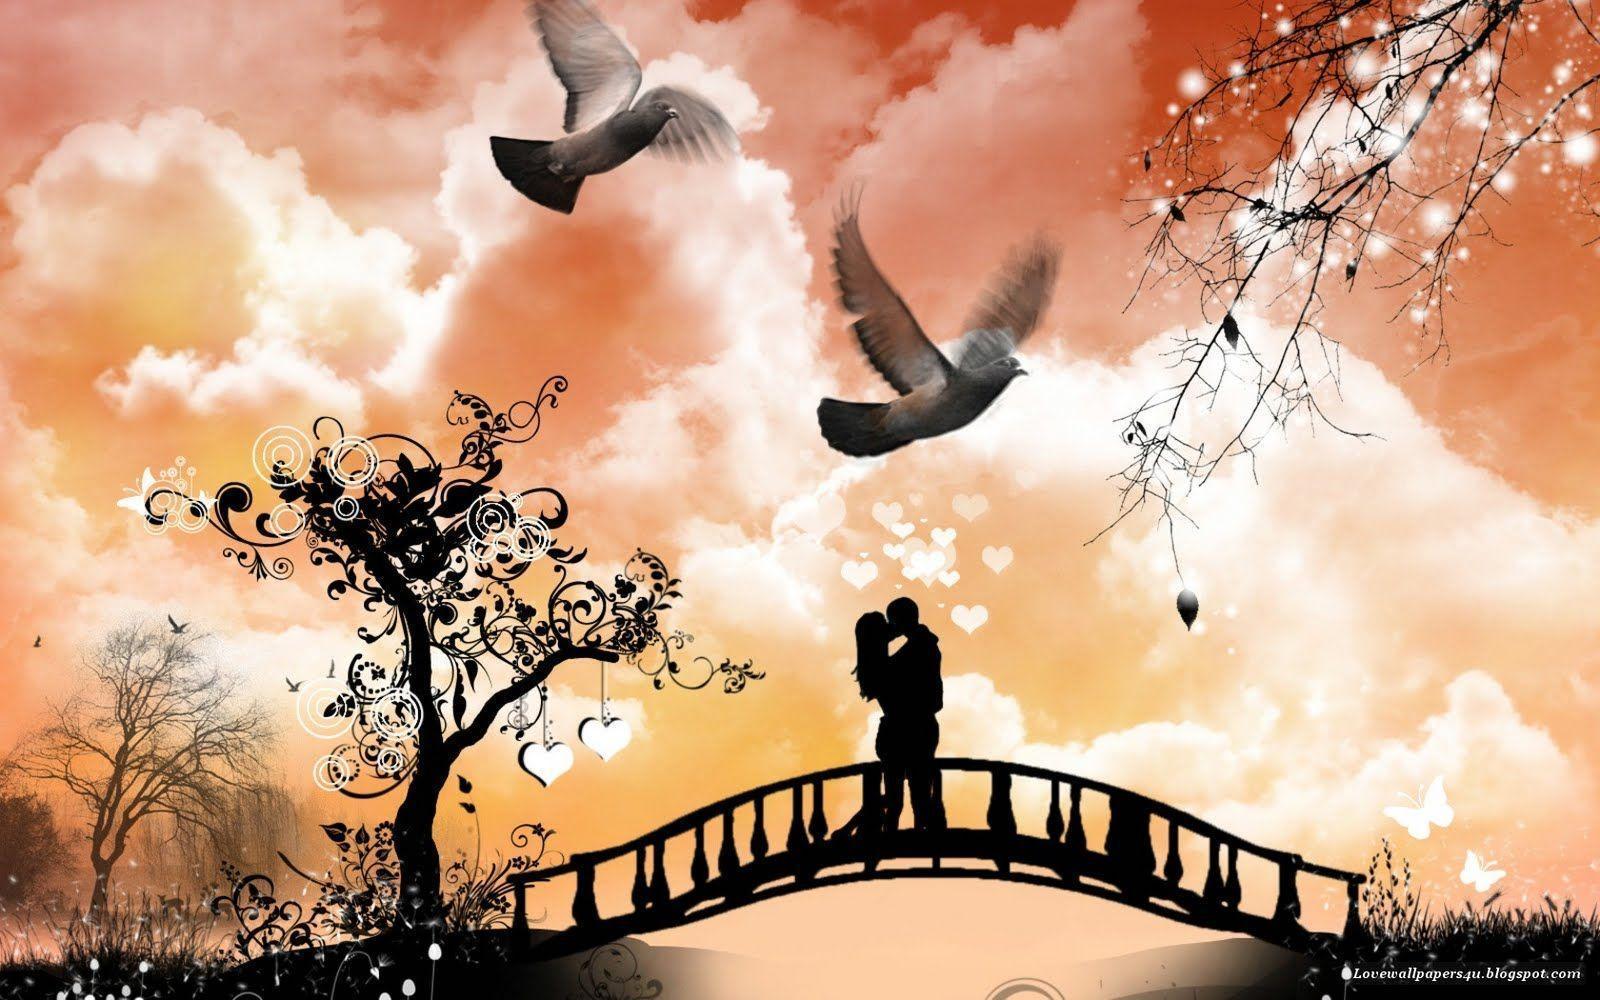 Wallpaper download hd love - Love Wallpapers Hd Best Cool Wallpaper